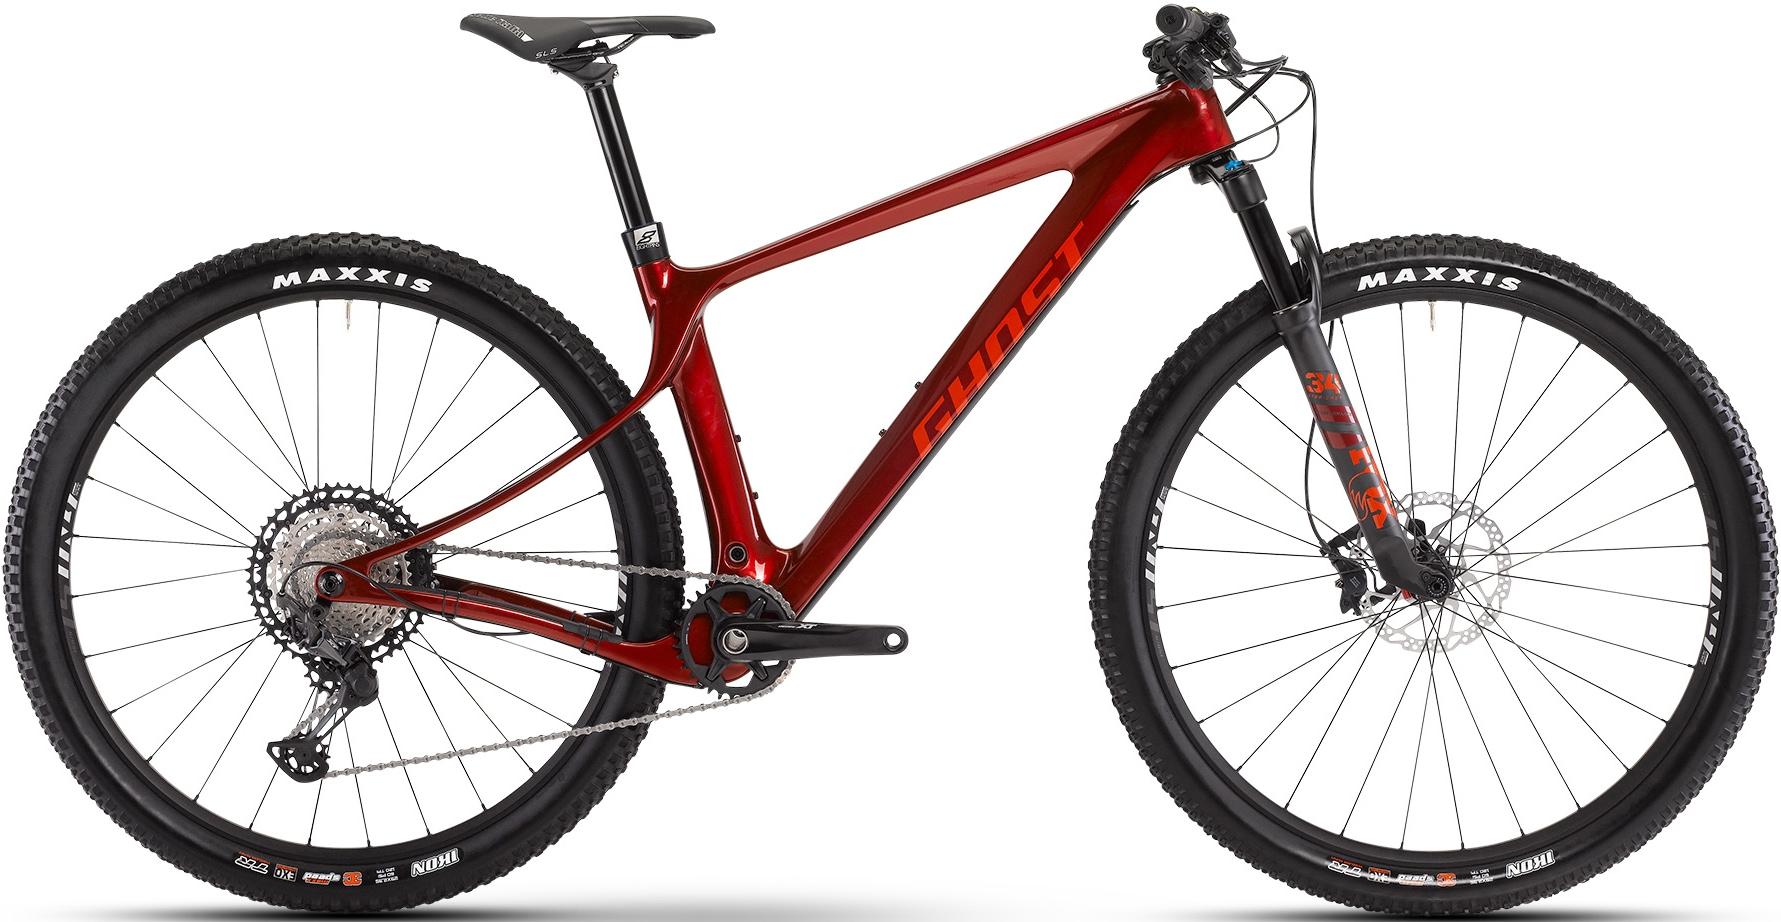 ghost mountainbike lector sf lc advanced 12 gang shimano xt schaltwerk kettenschaltung - Schwalbe Reifenheber 3-er Set blau , Schwalbe